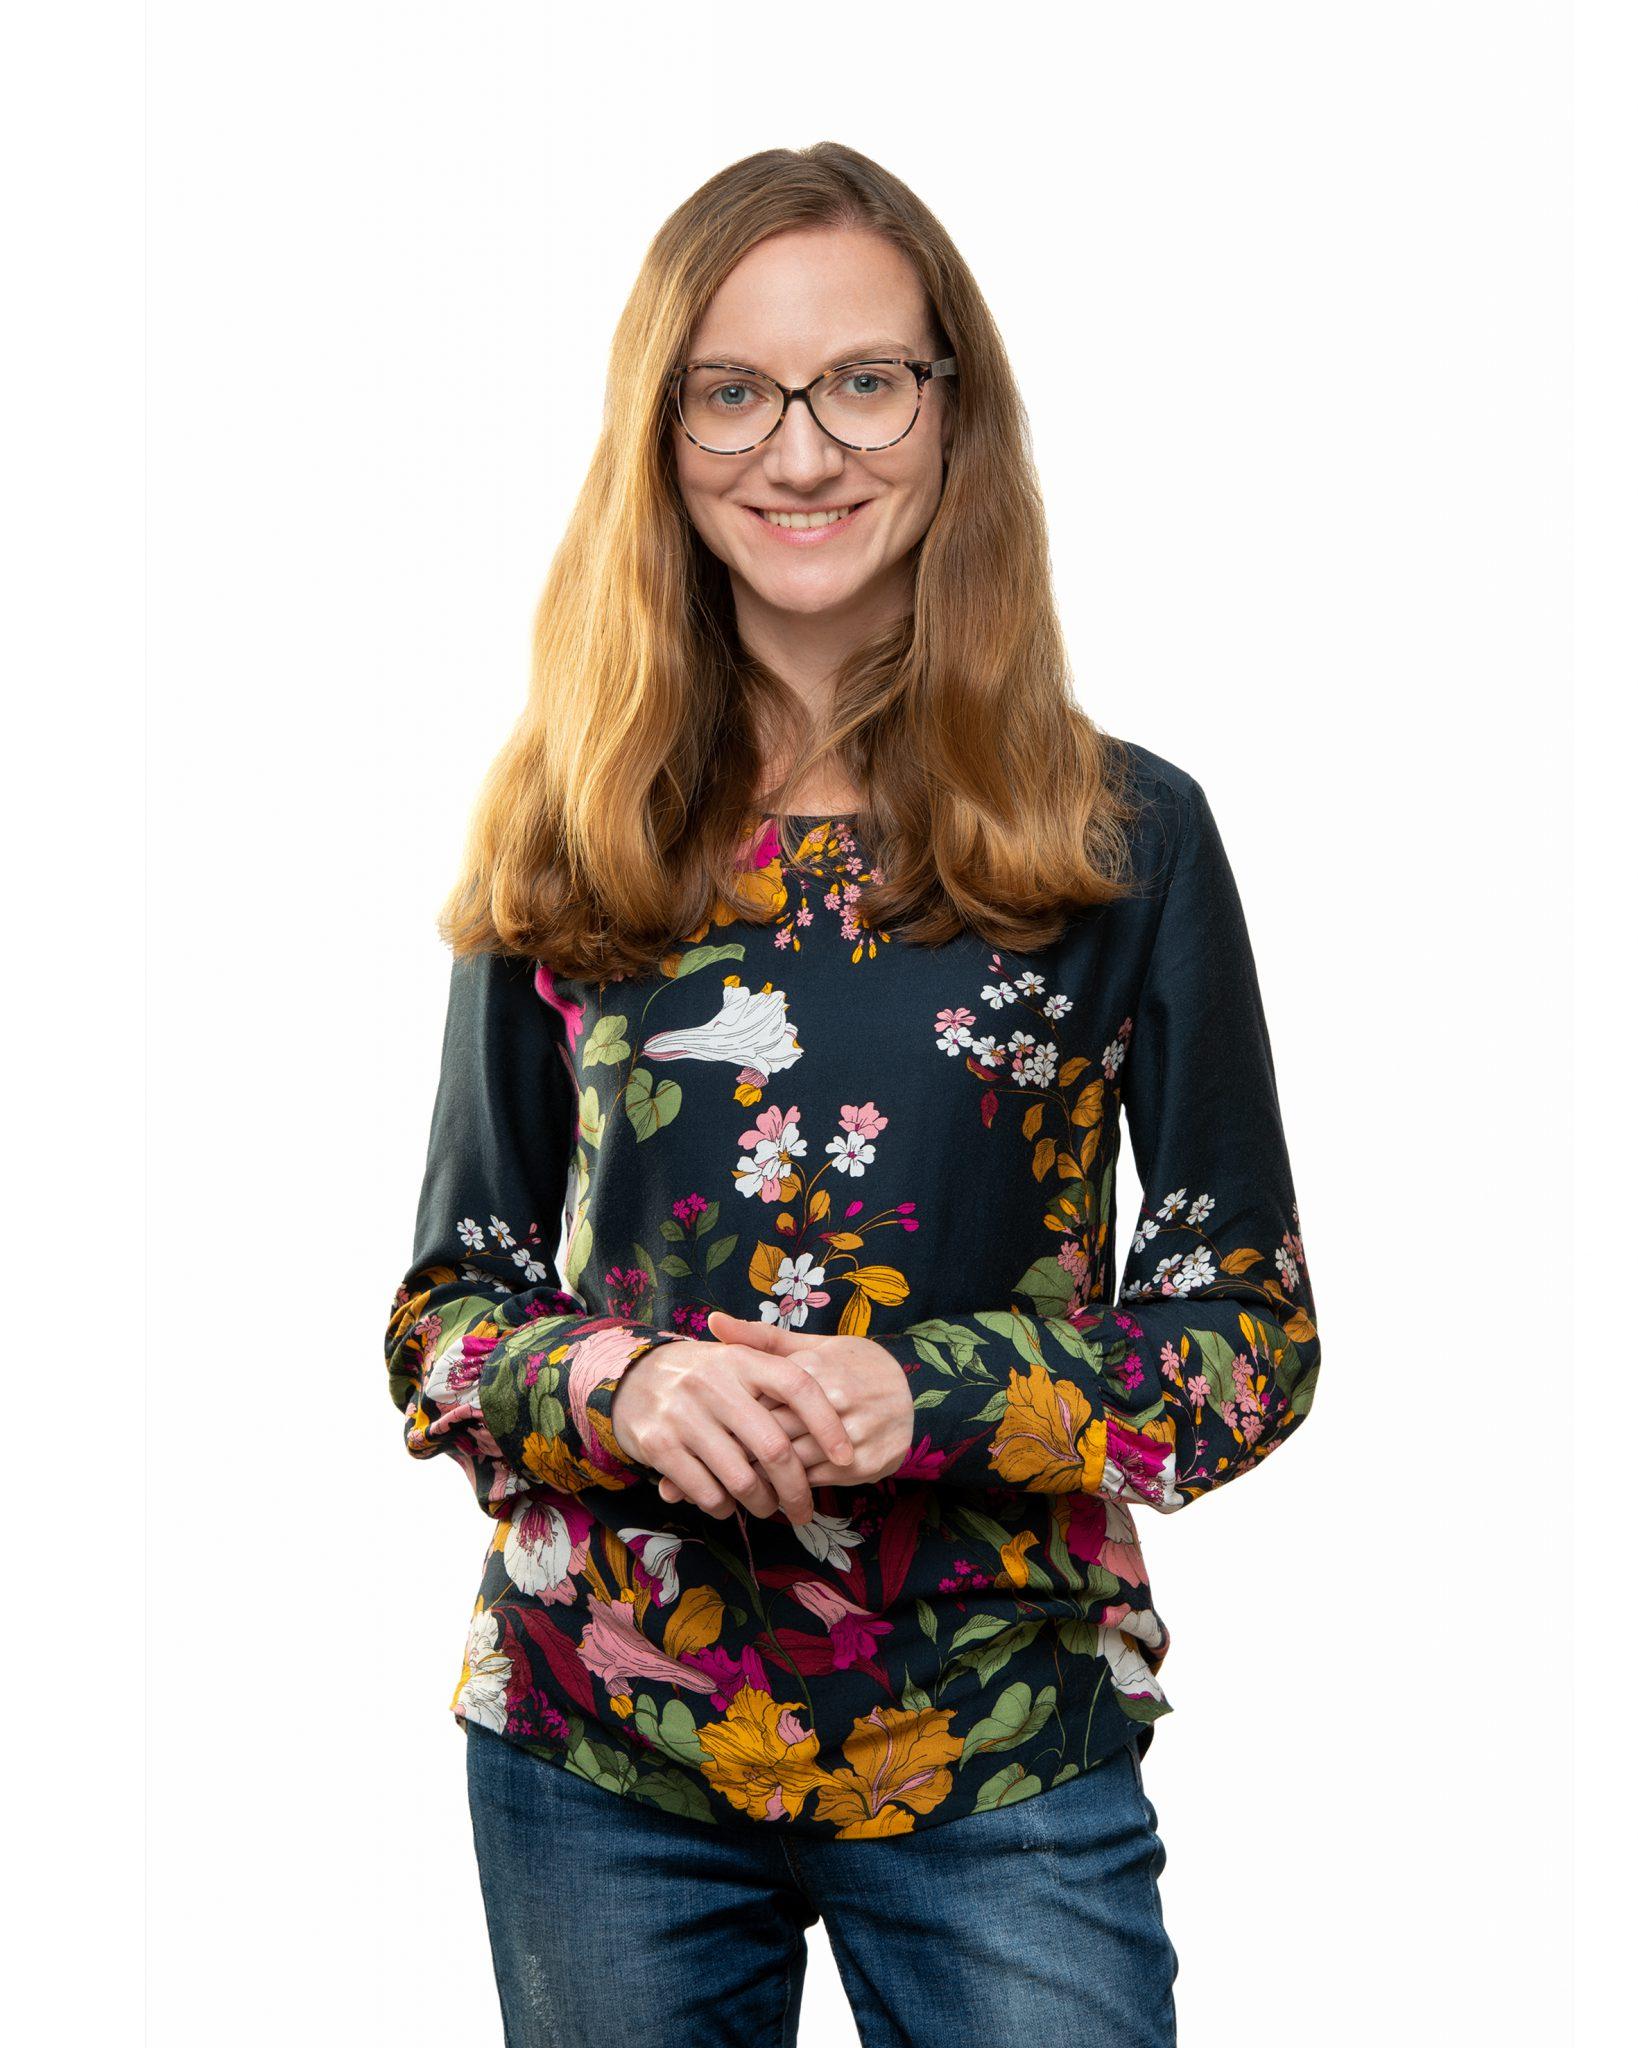 Klaudia Bojko